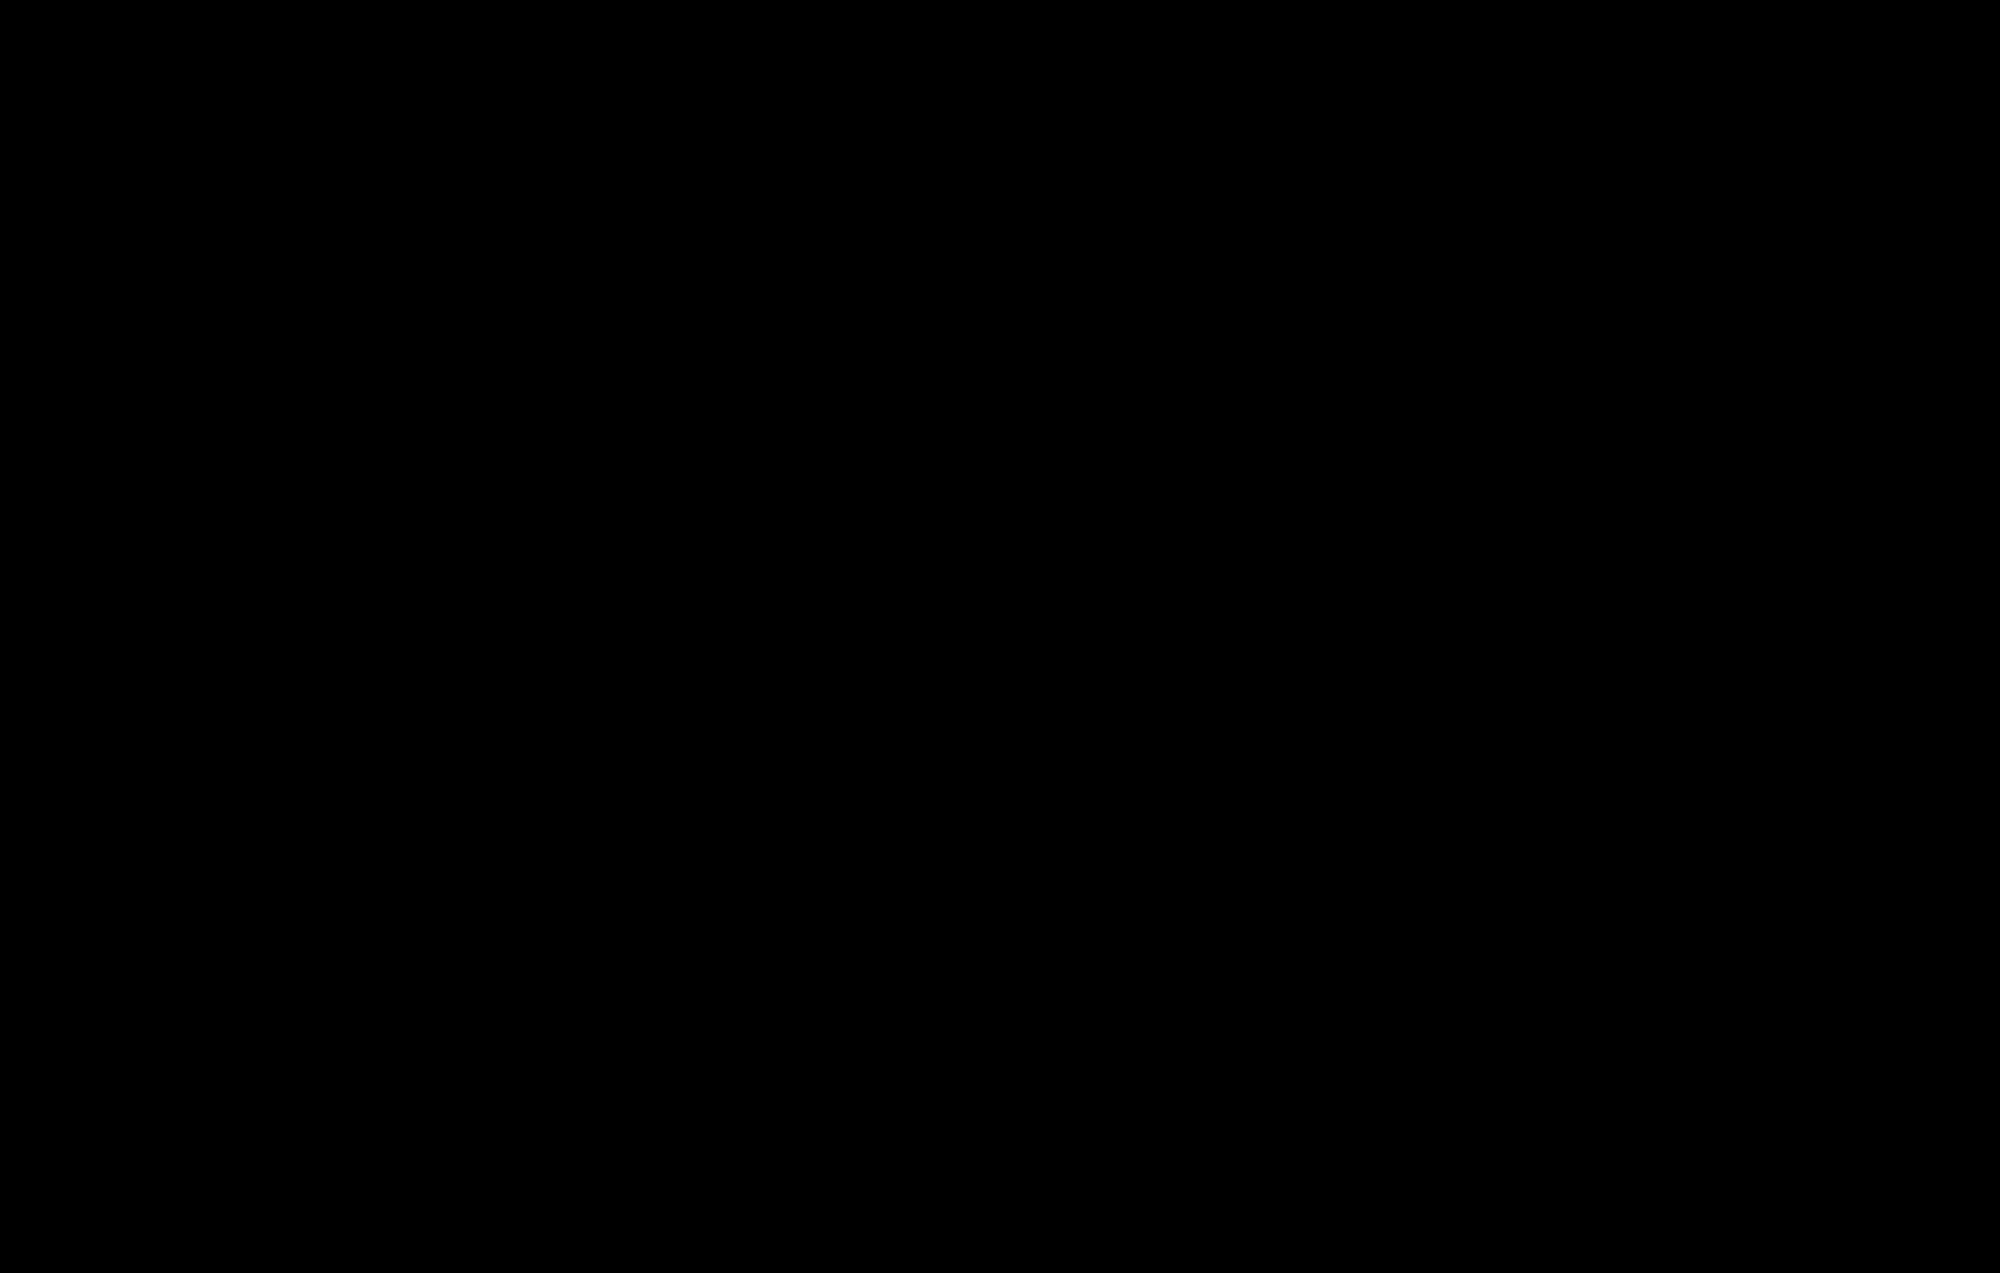 uefa europa league logo svg